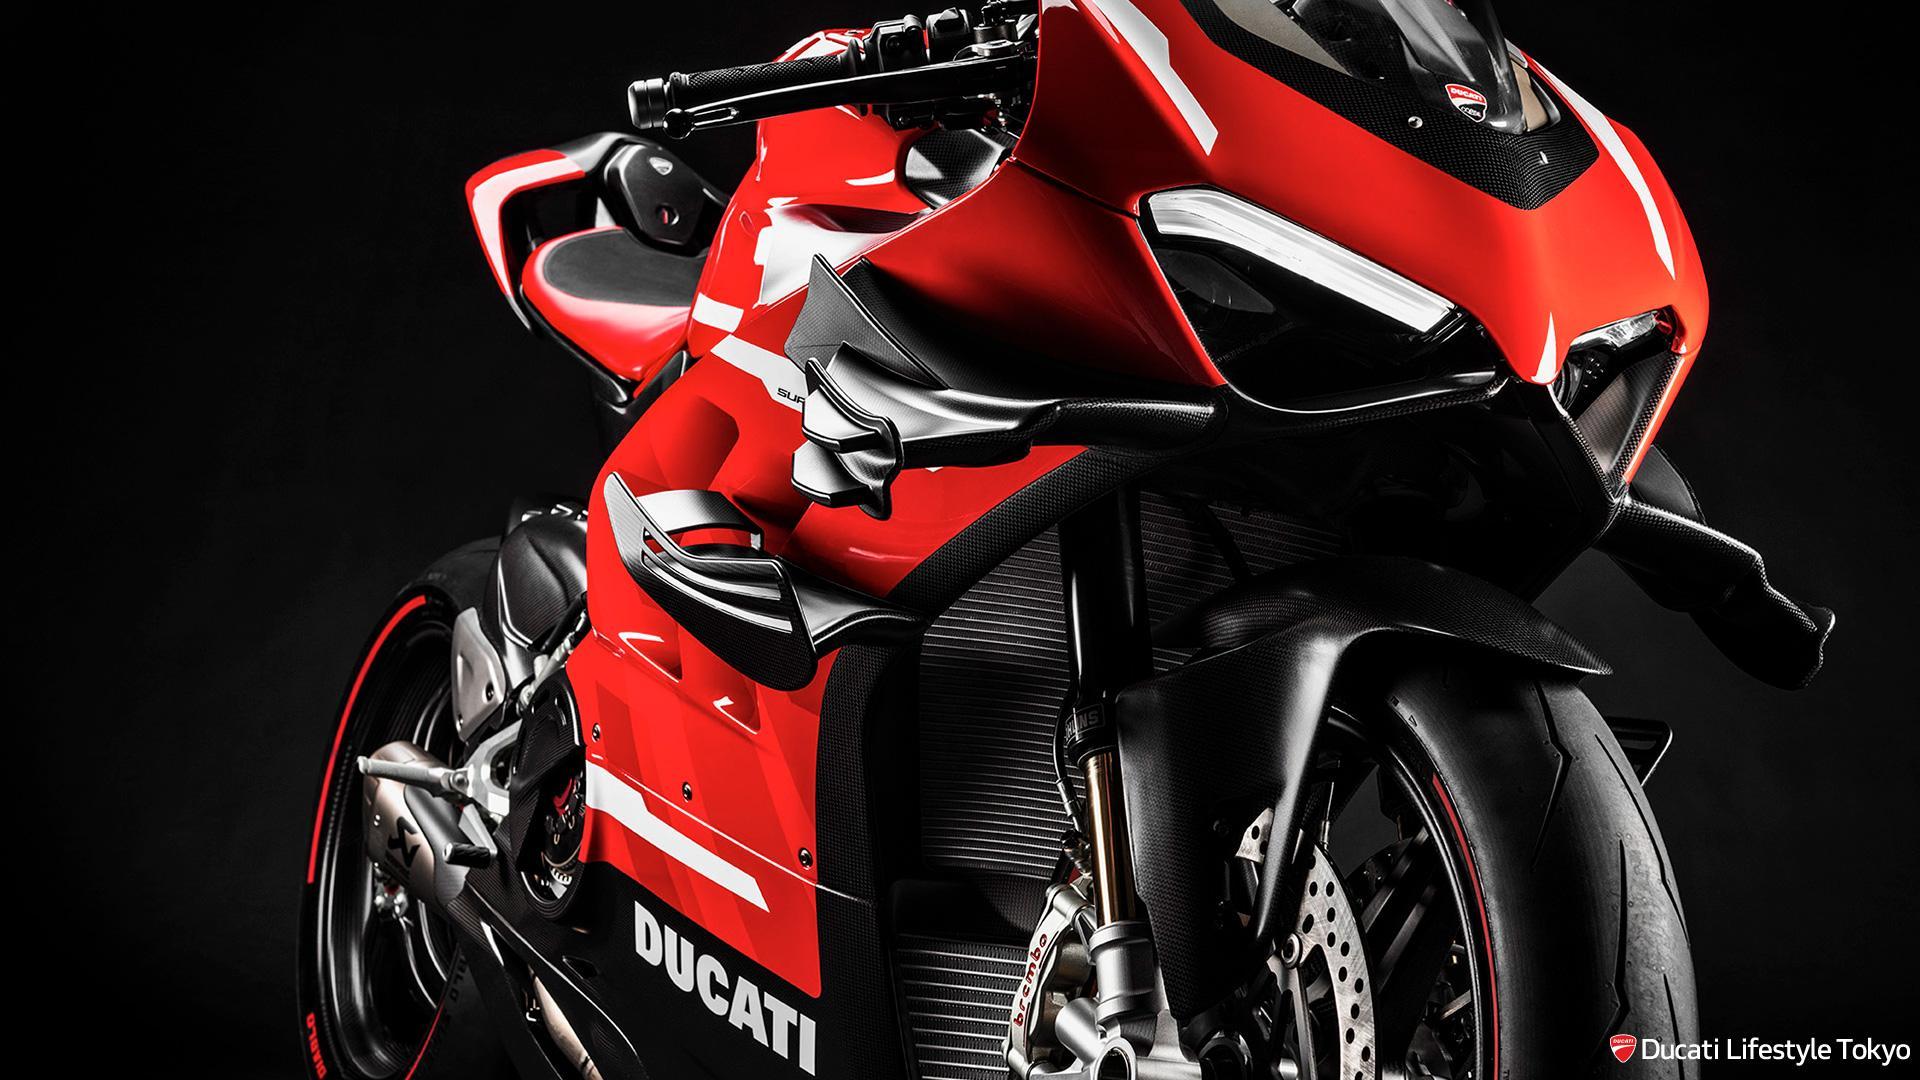 Ducati Lifestyle Tokyo